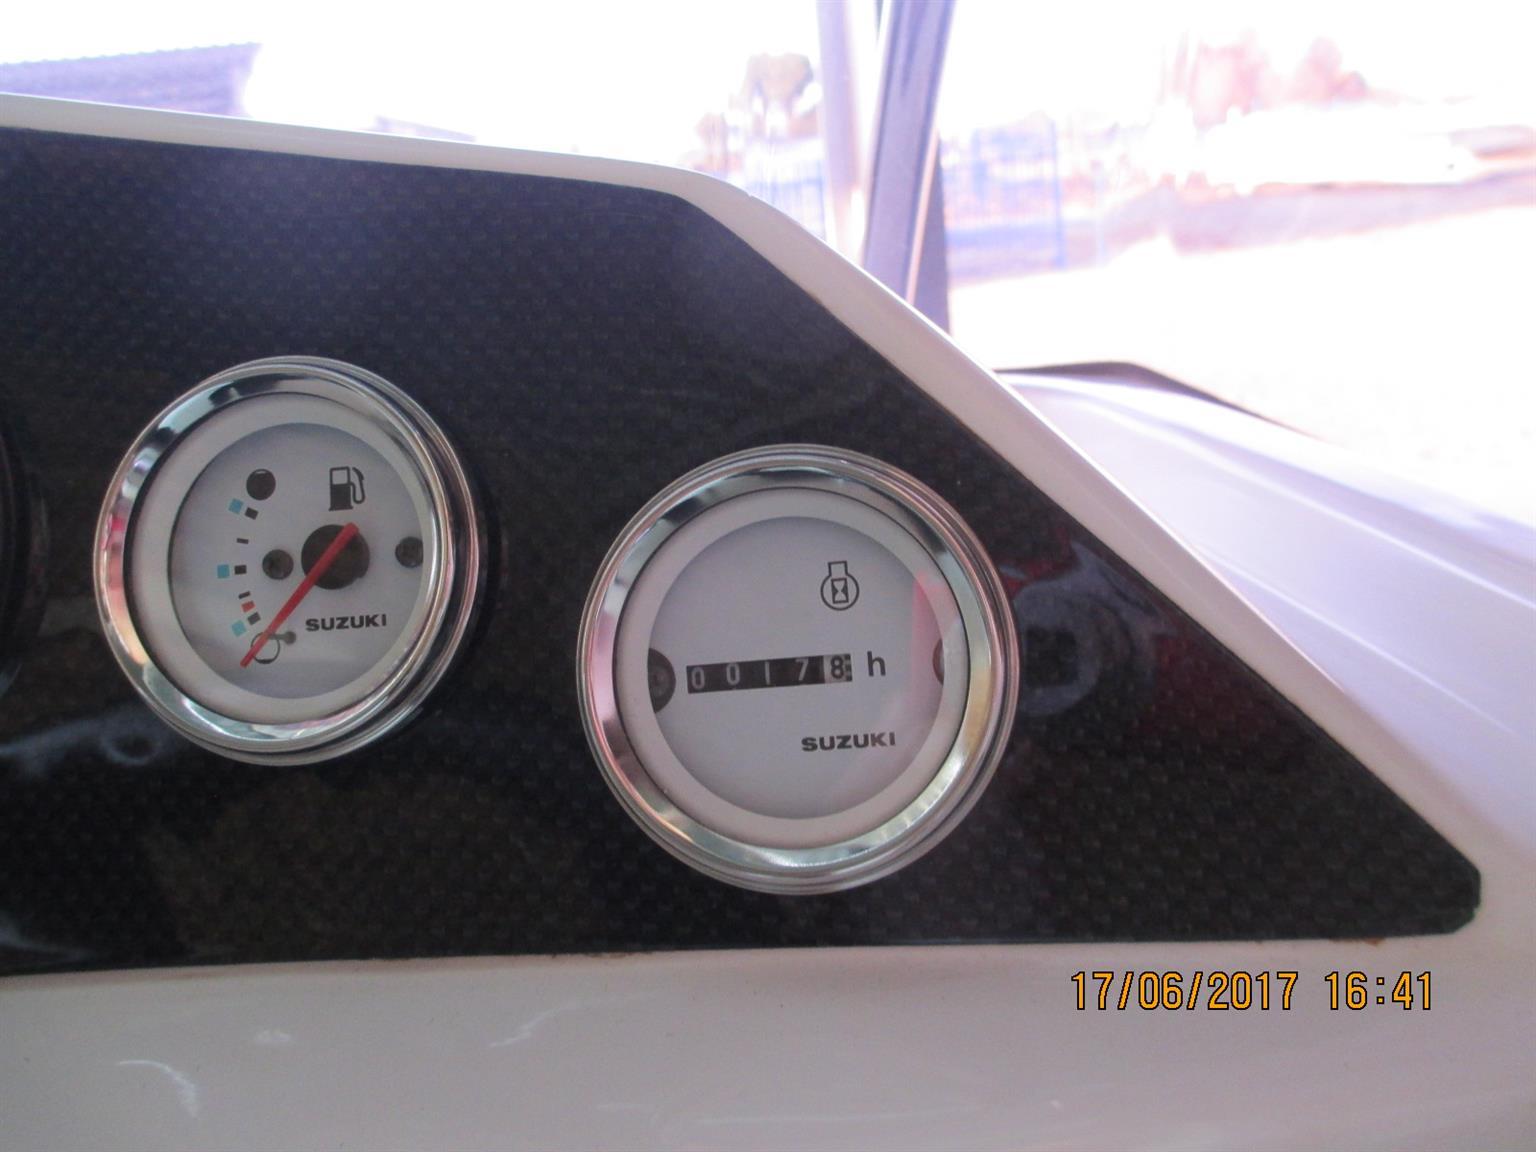 Ace Jazz fitted with 115hp 4stroke Suzuki Engine